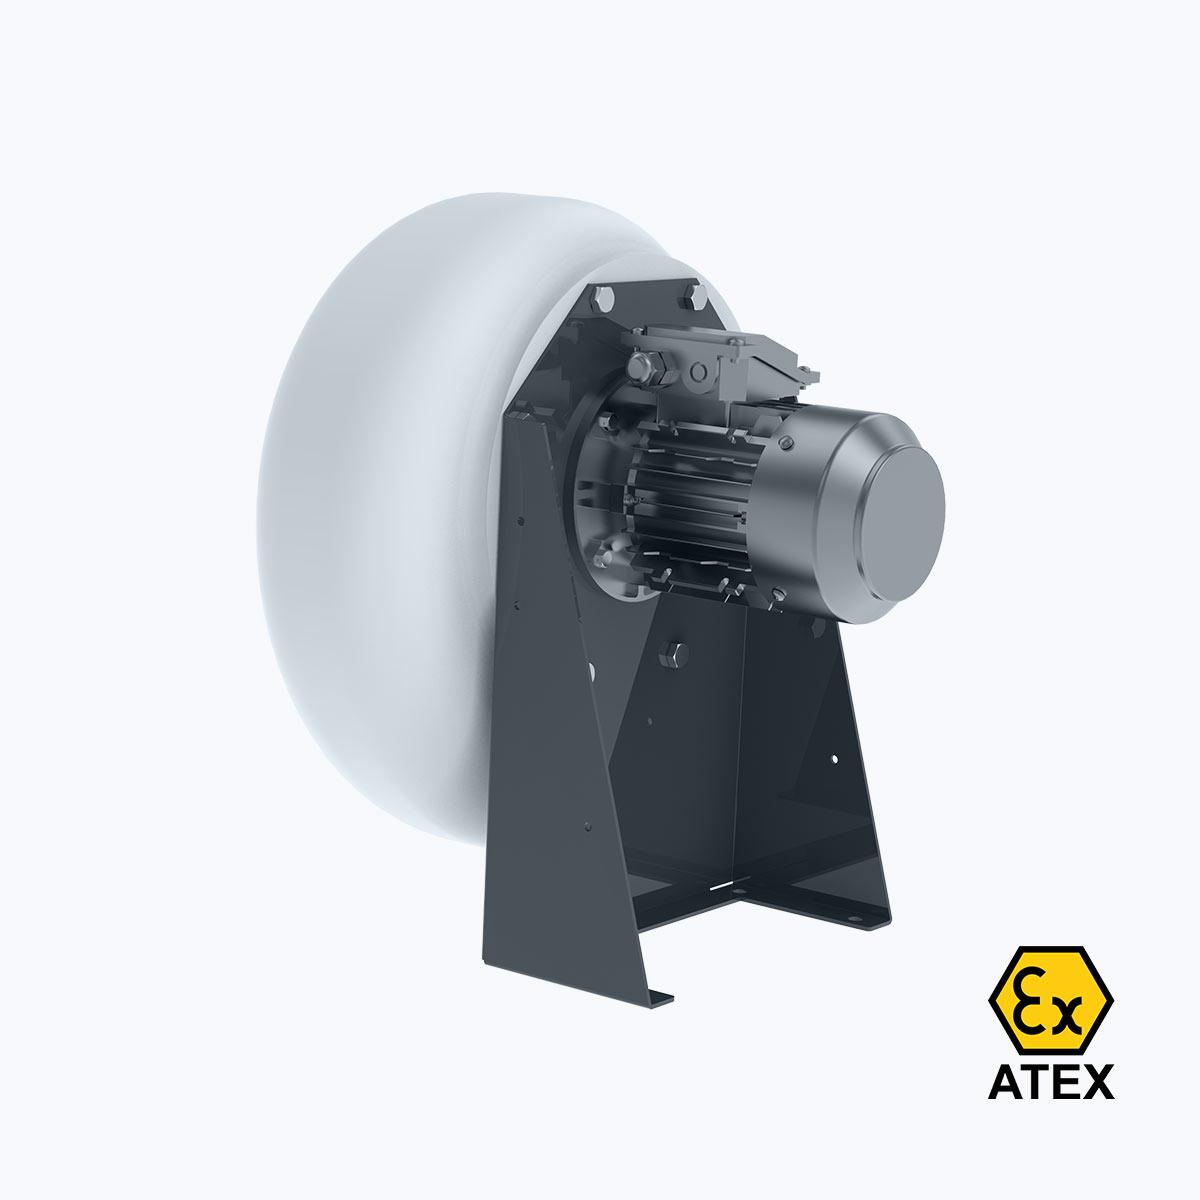 Ventinet.nl Plastic Ventilator Vn B Atex Motor